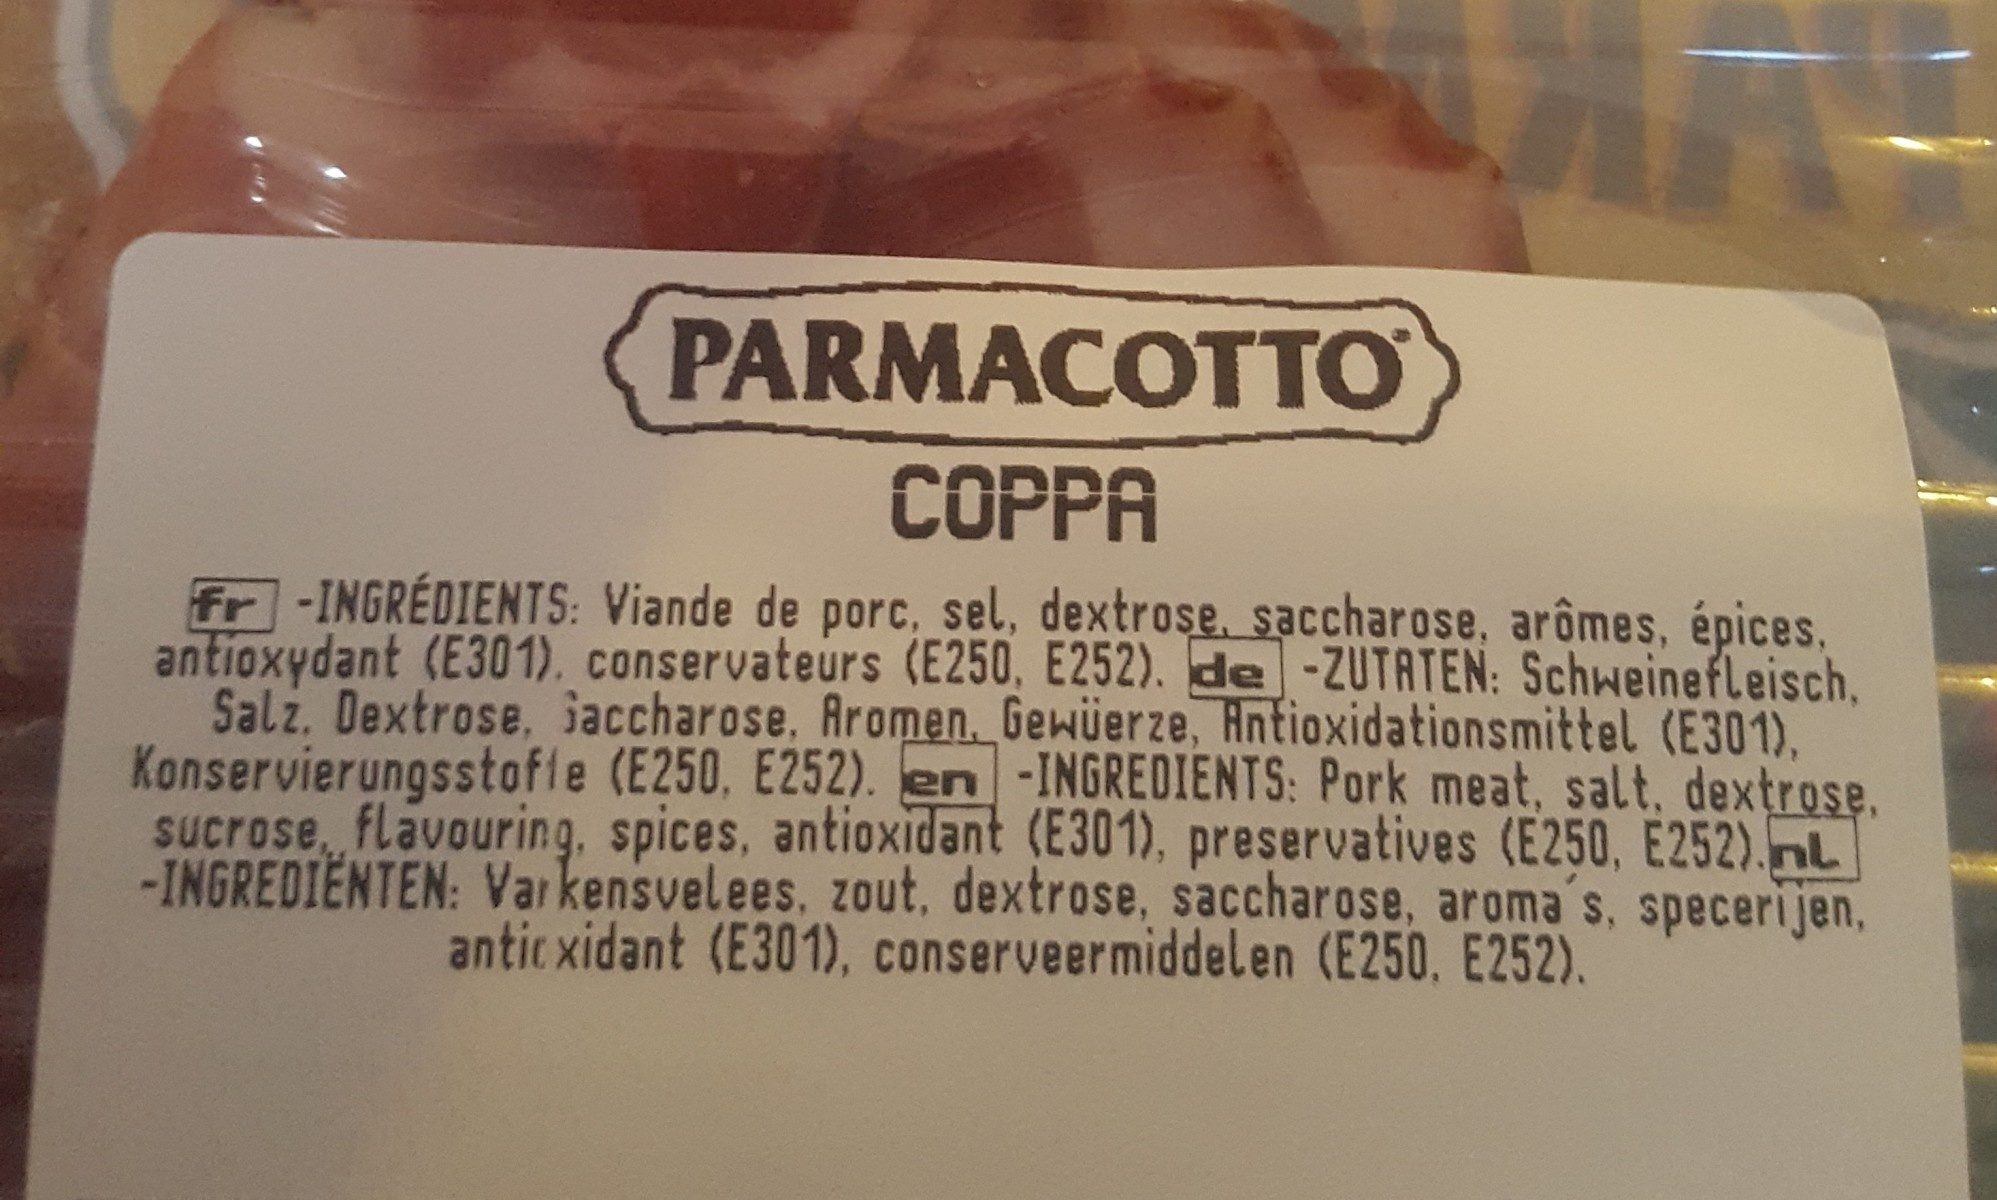 coppa - Ingredients